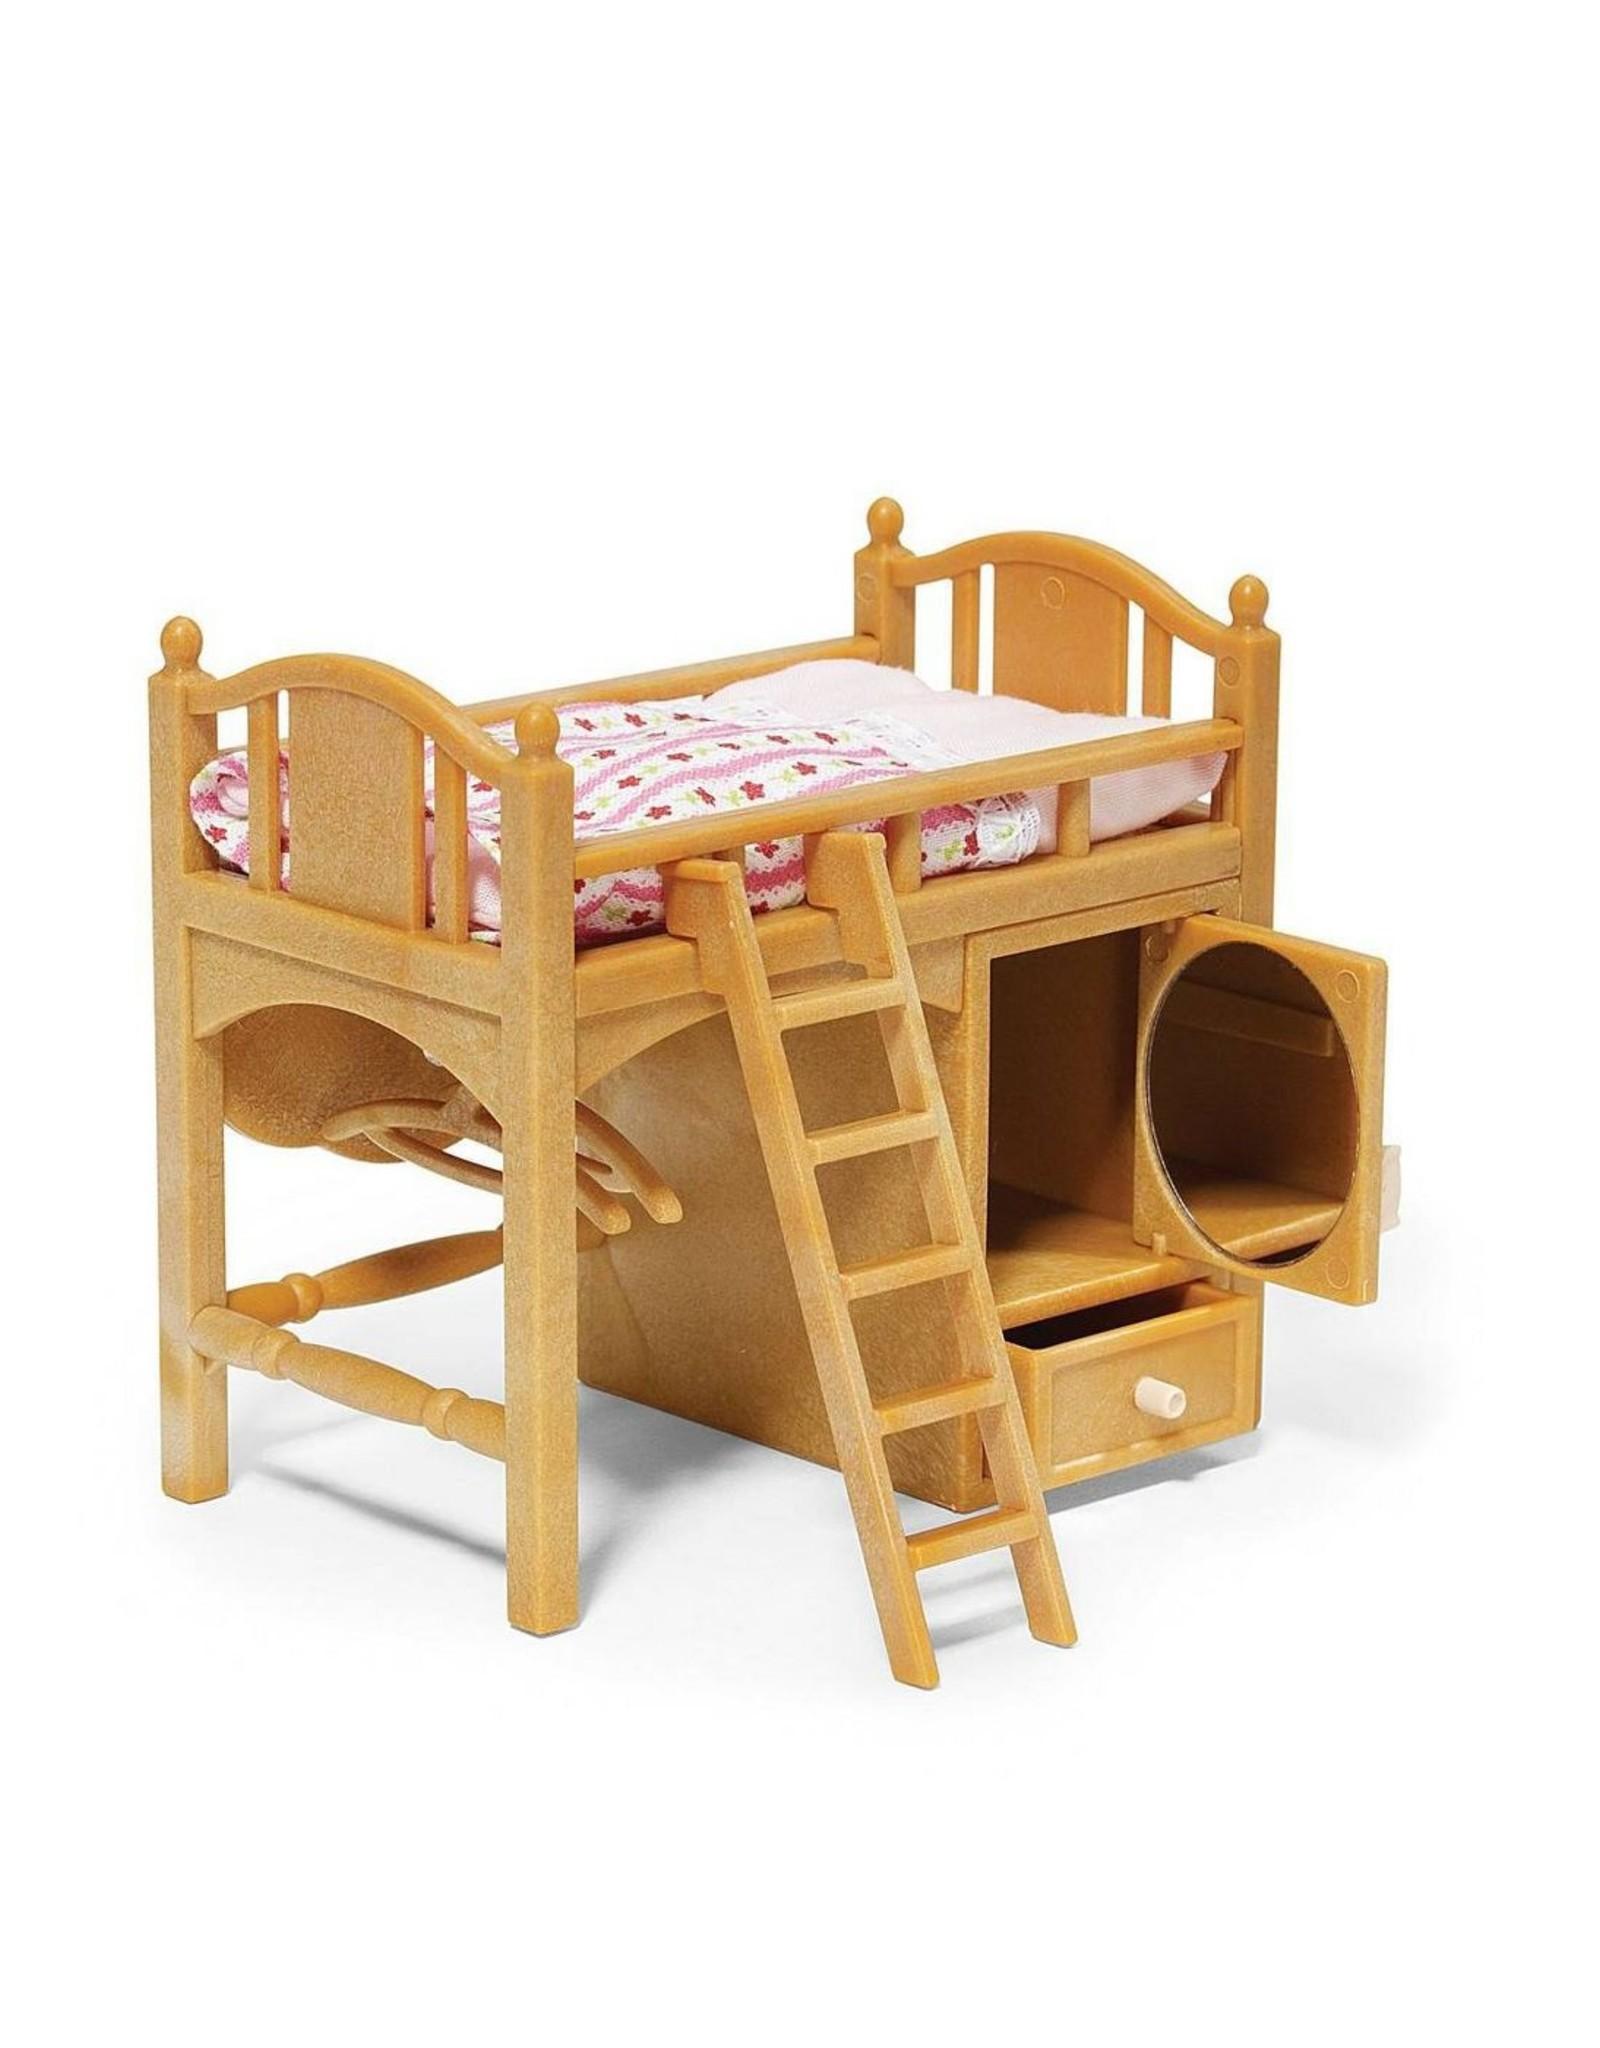 Calico Critters CC Loft Bed